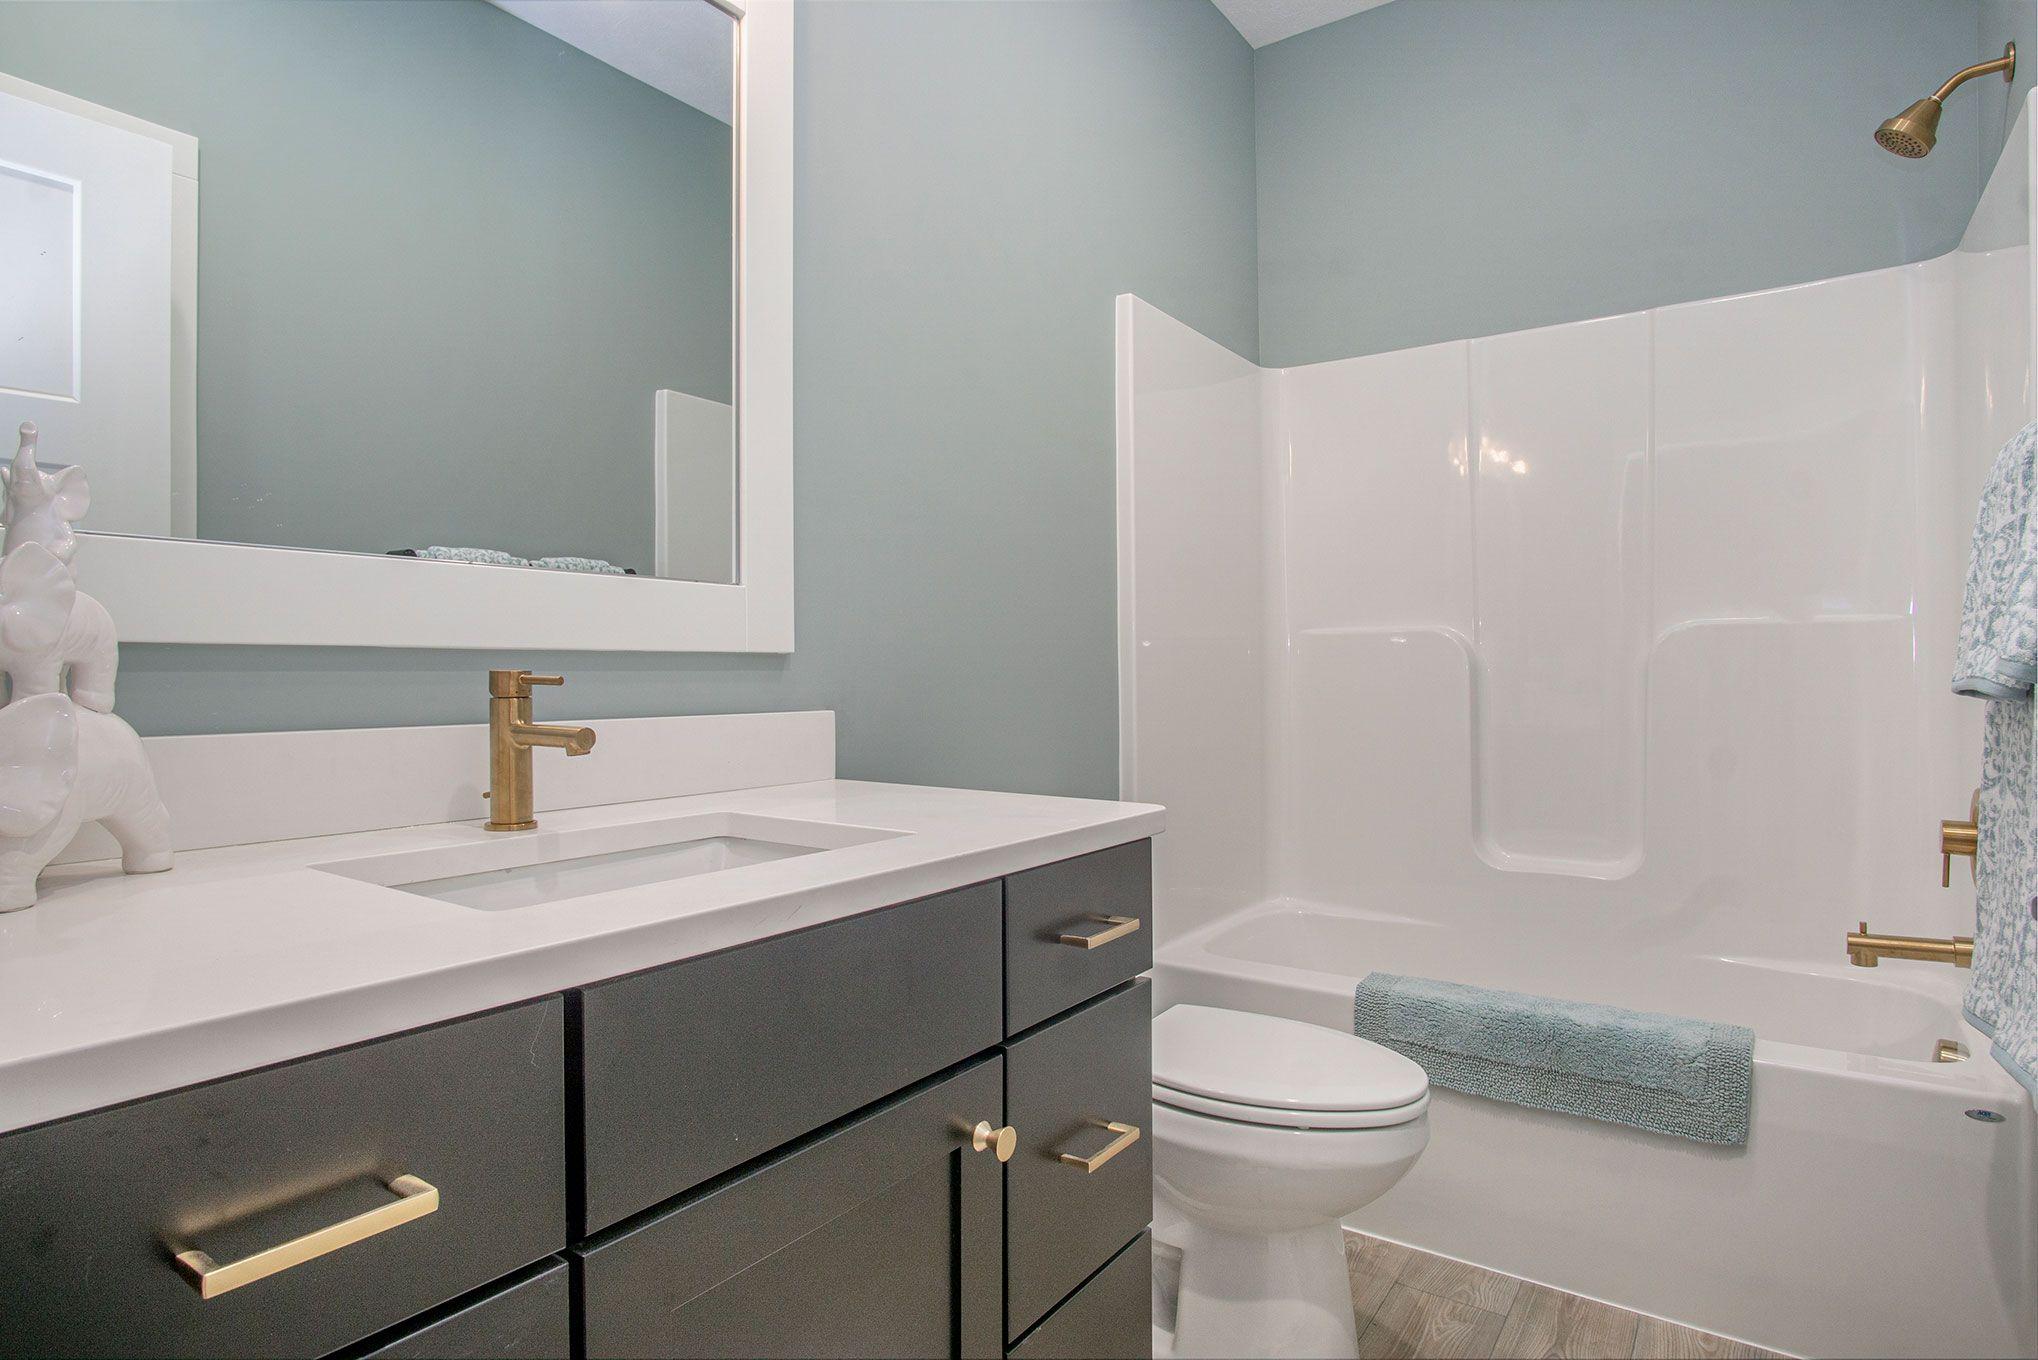 Bathroom featured in The Jasmine By Eastbrook Homes Inc. in Grand Rapids, MI